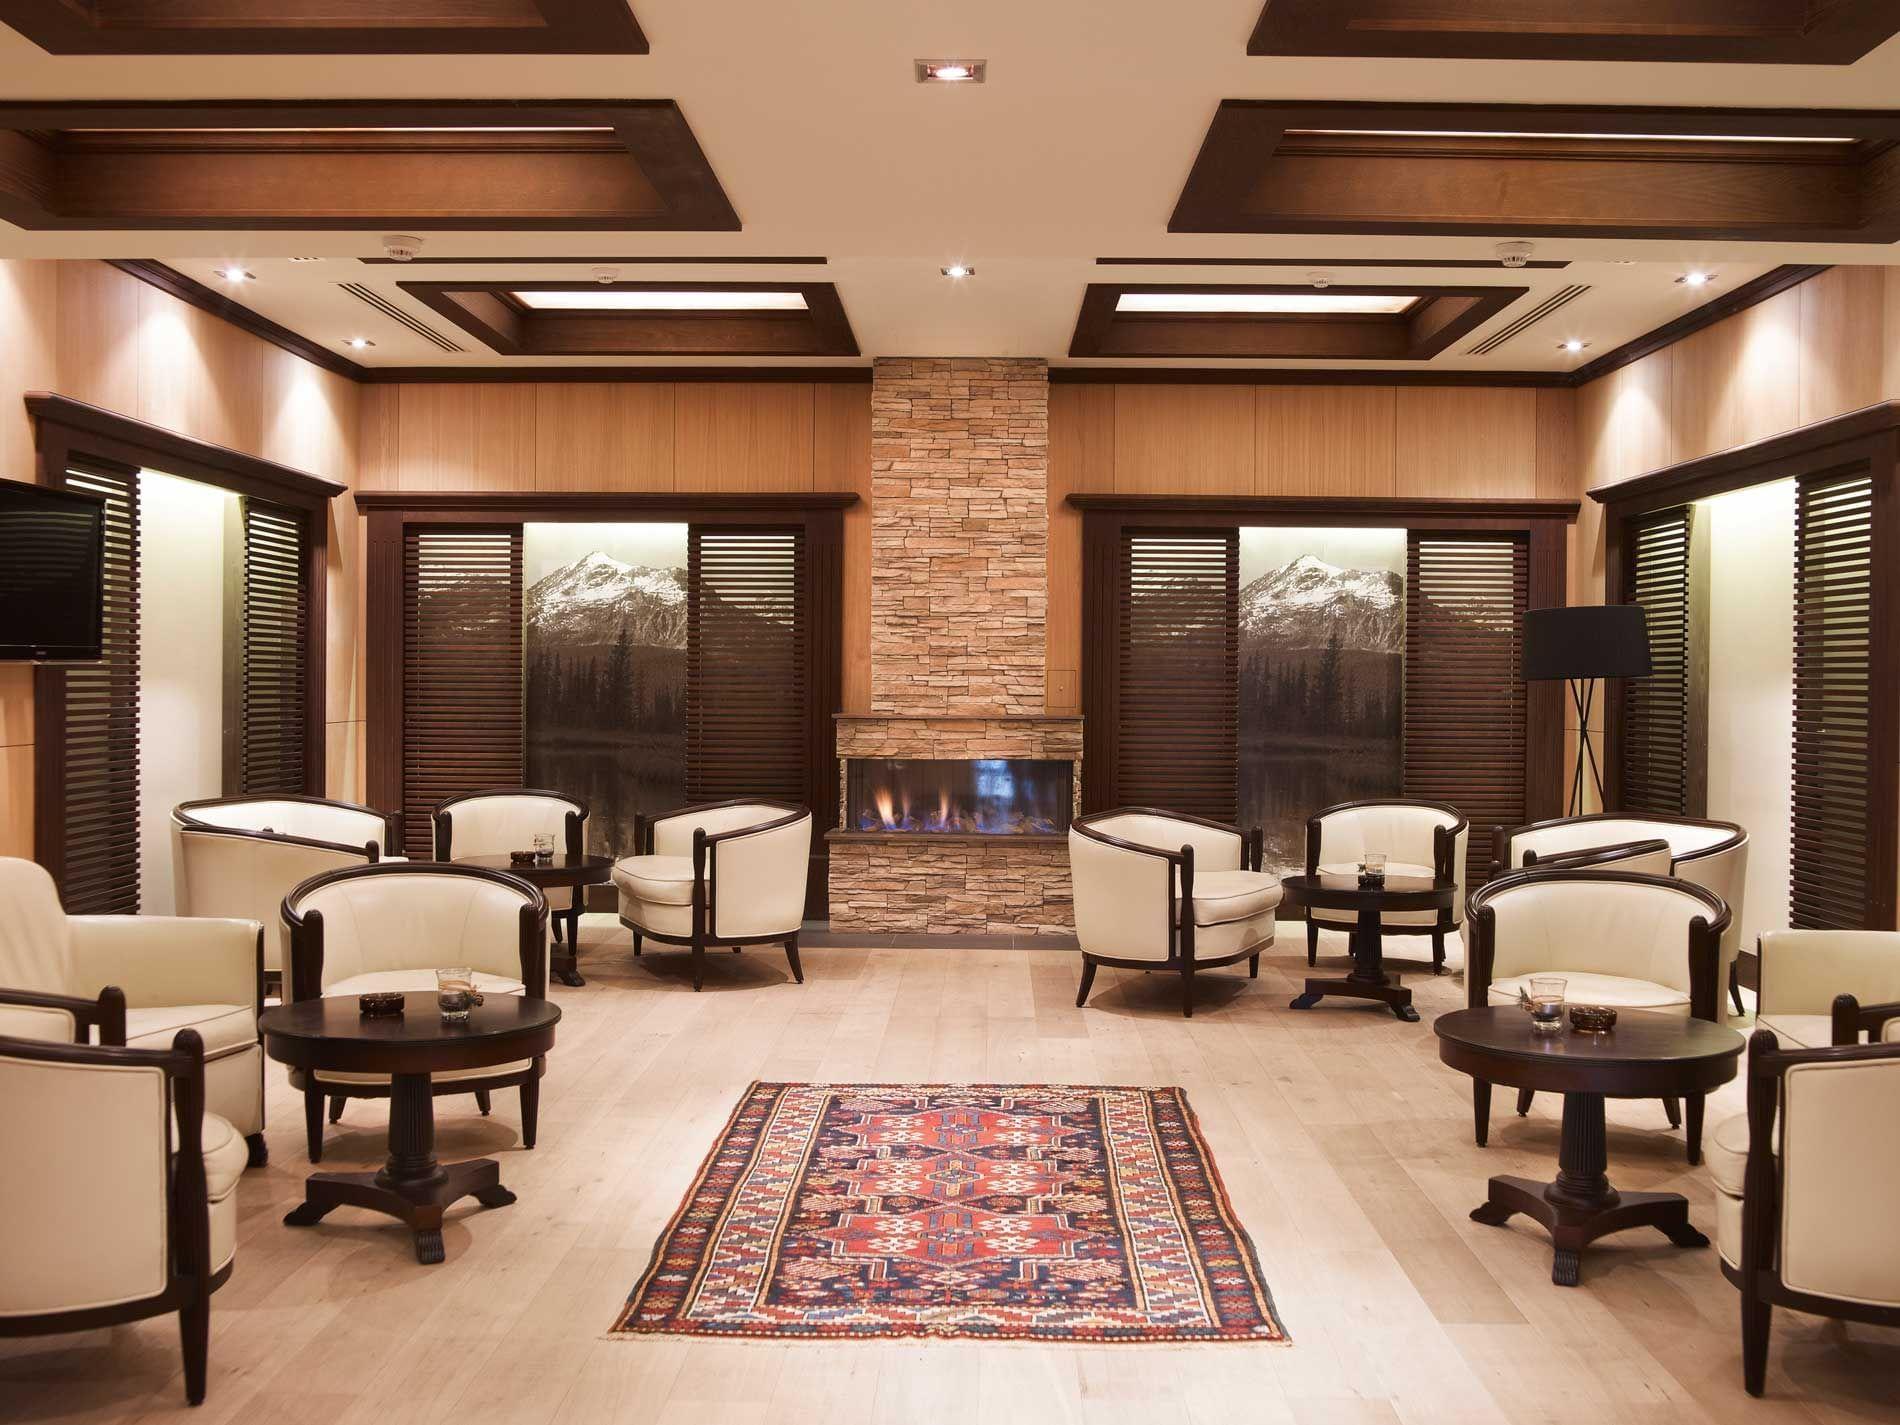 Interior of the Lobby bar at Ana Hotels Sport Poiana Brașov